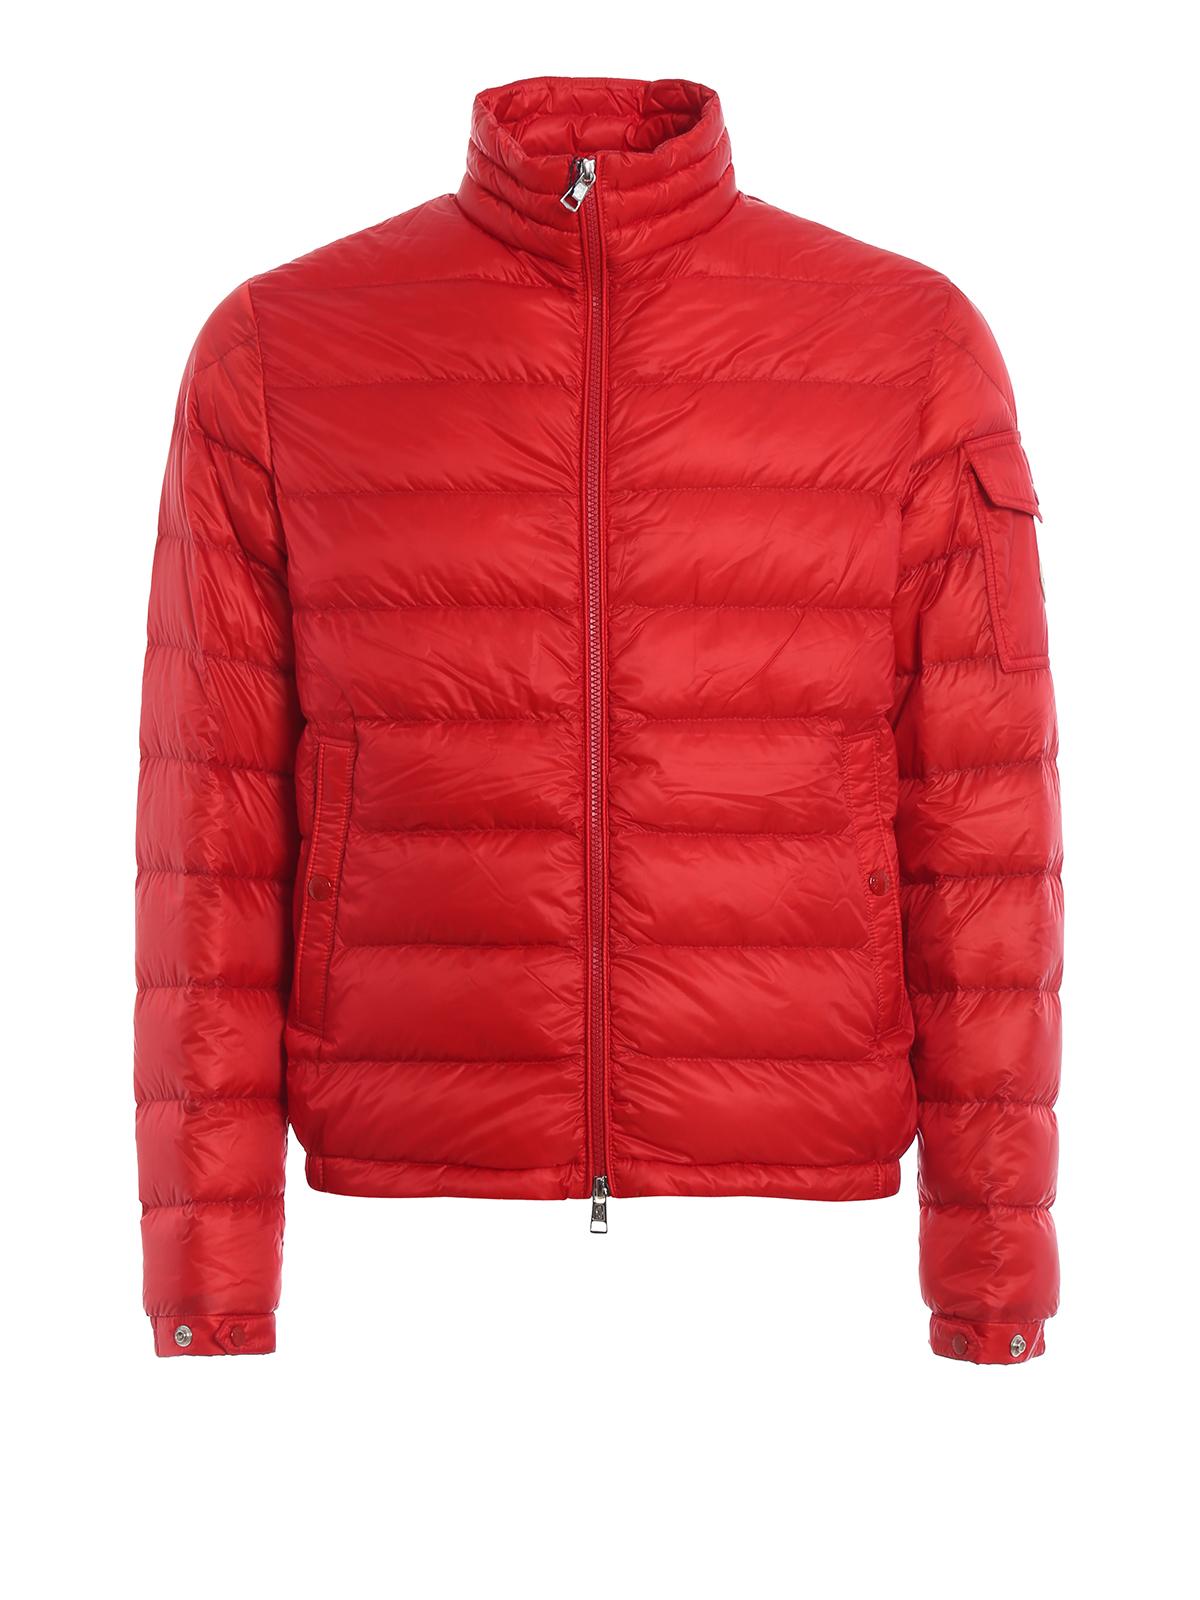 5c14713af Moncler - Lambot red puffer jacket - padded jackets - E1 091 4039399 ...